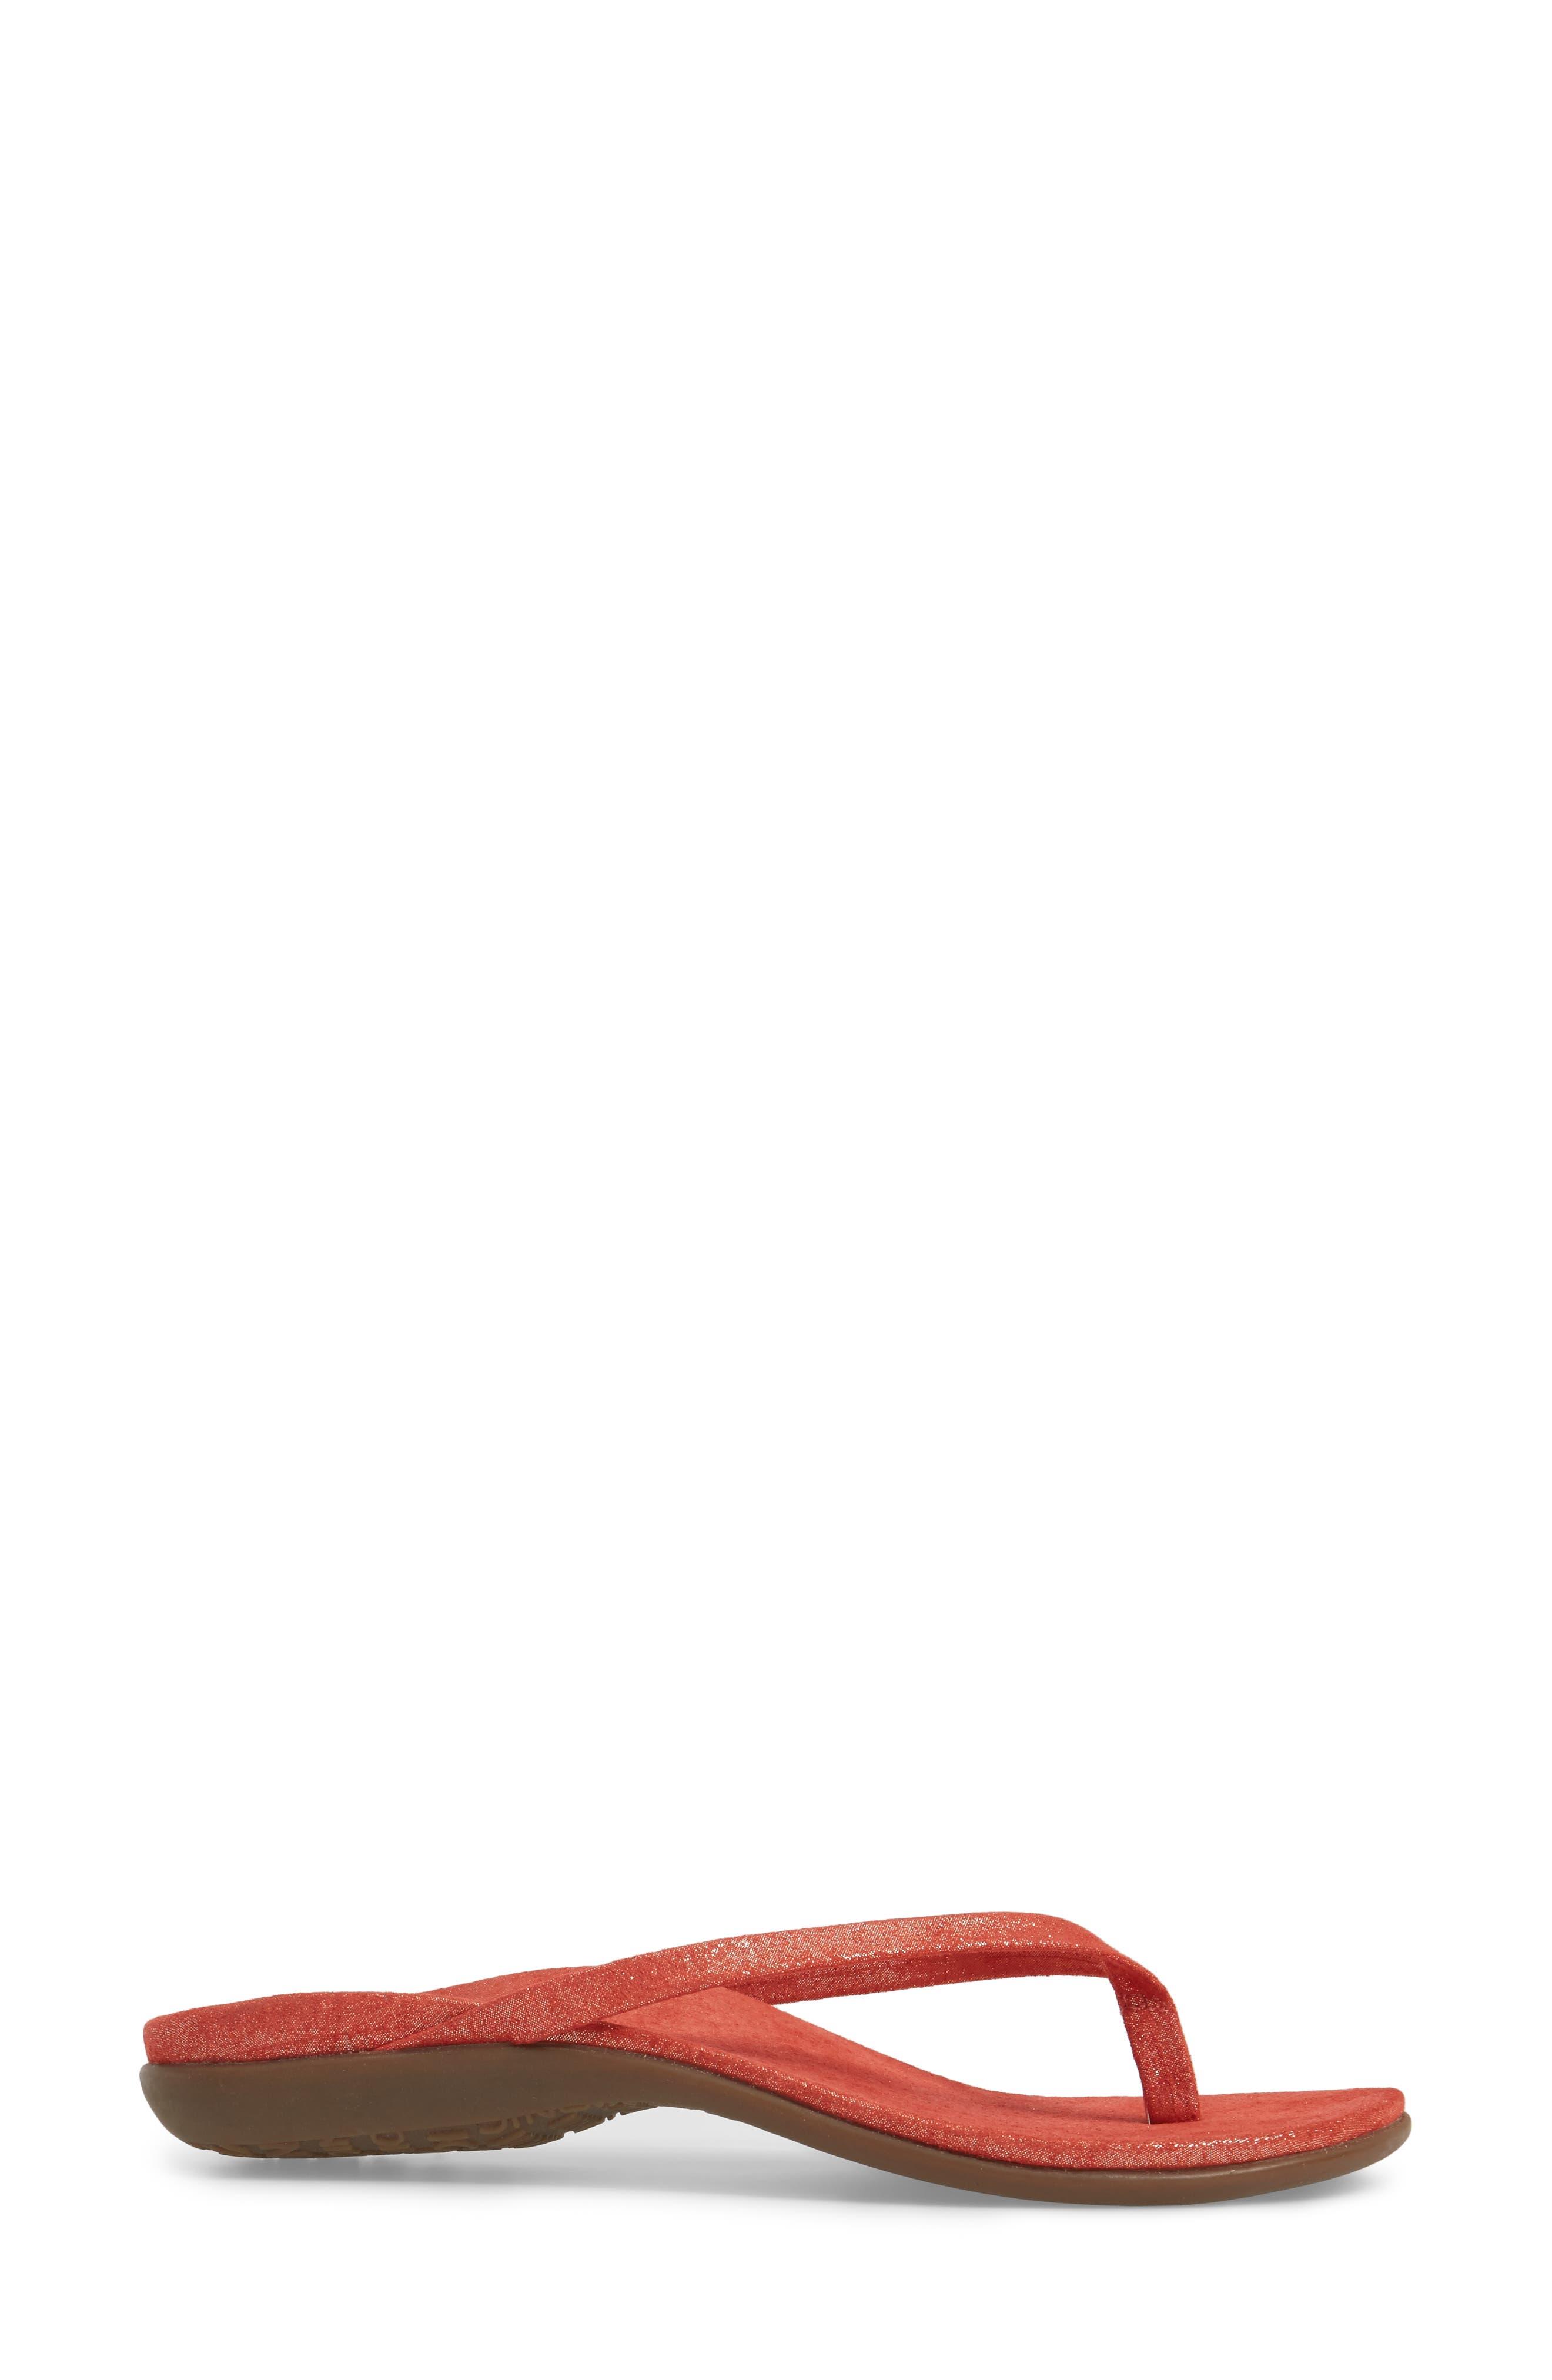 Alternate Image 3  - Vionic 'Corfu' Sandal (Women)